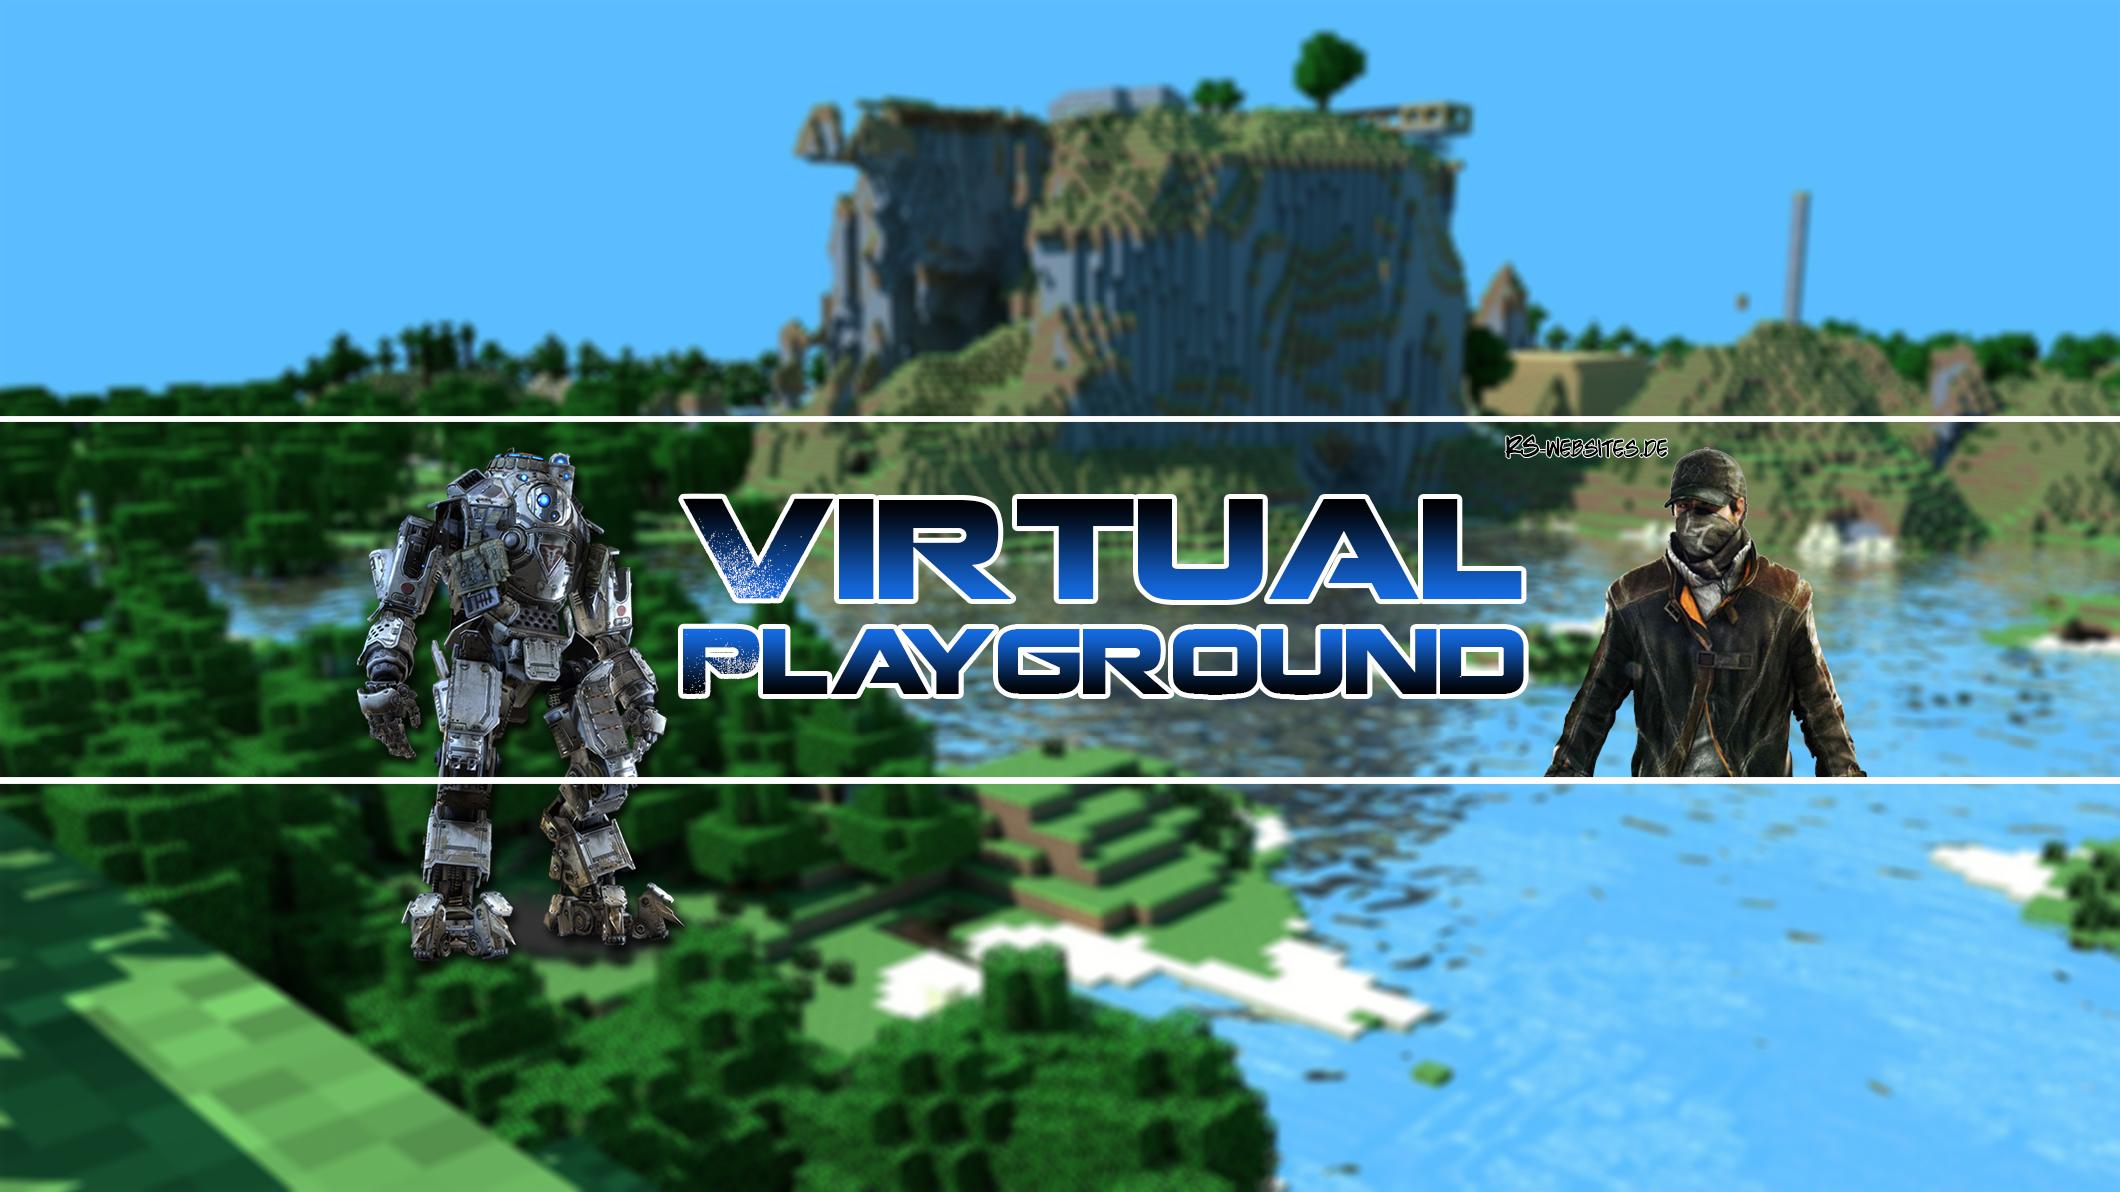 Virtual Playground YouTube Banner